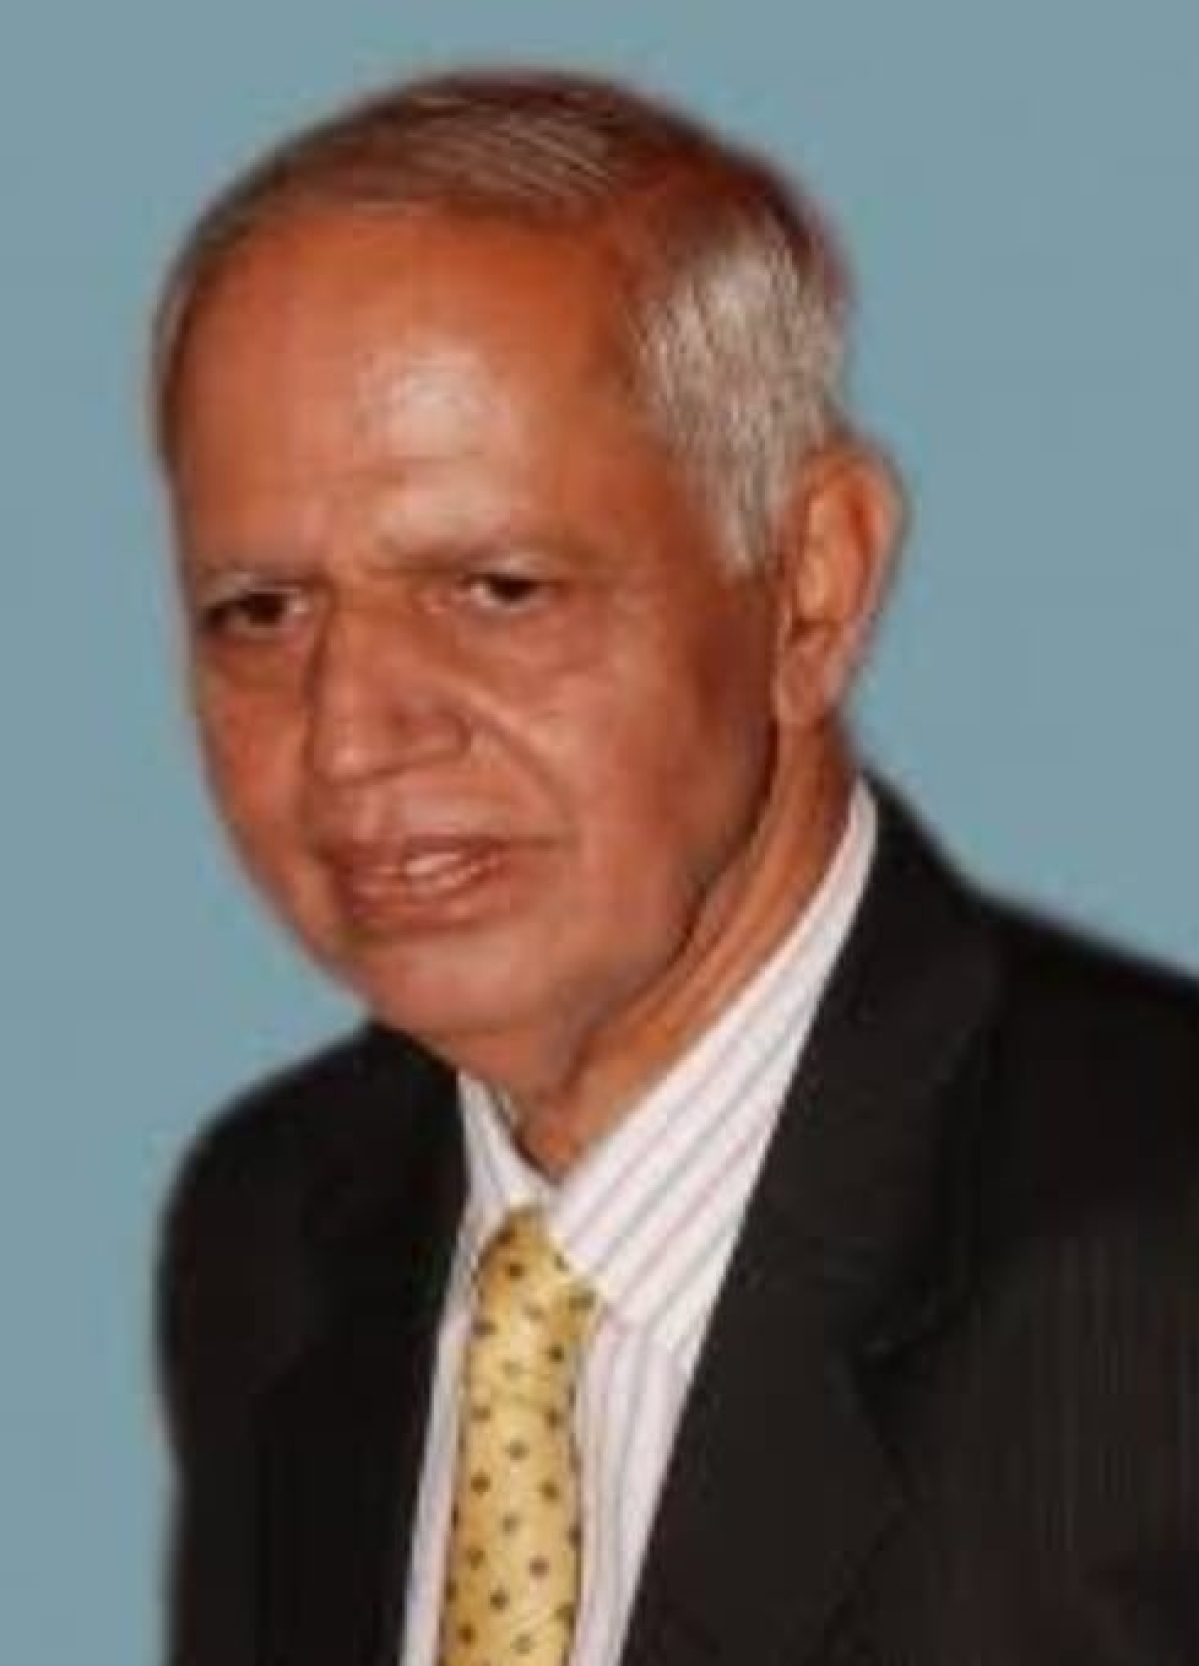 Ujjain: 'Vaccinate rapidly, vaccinate free or perish'